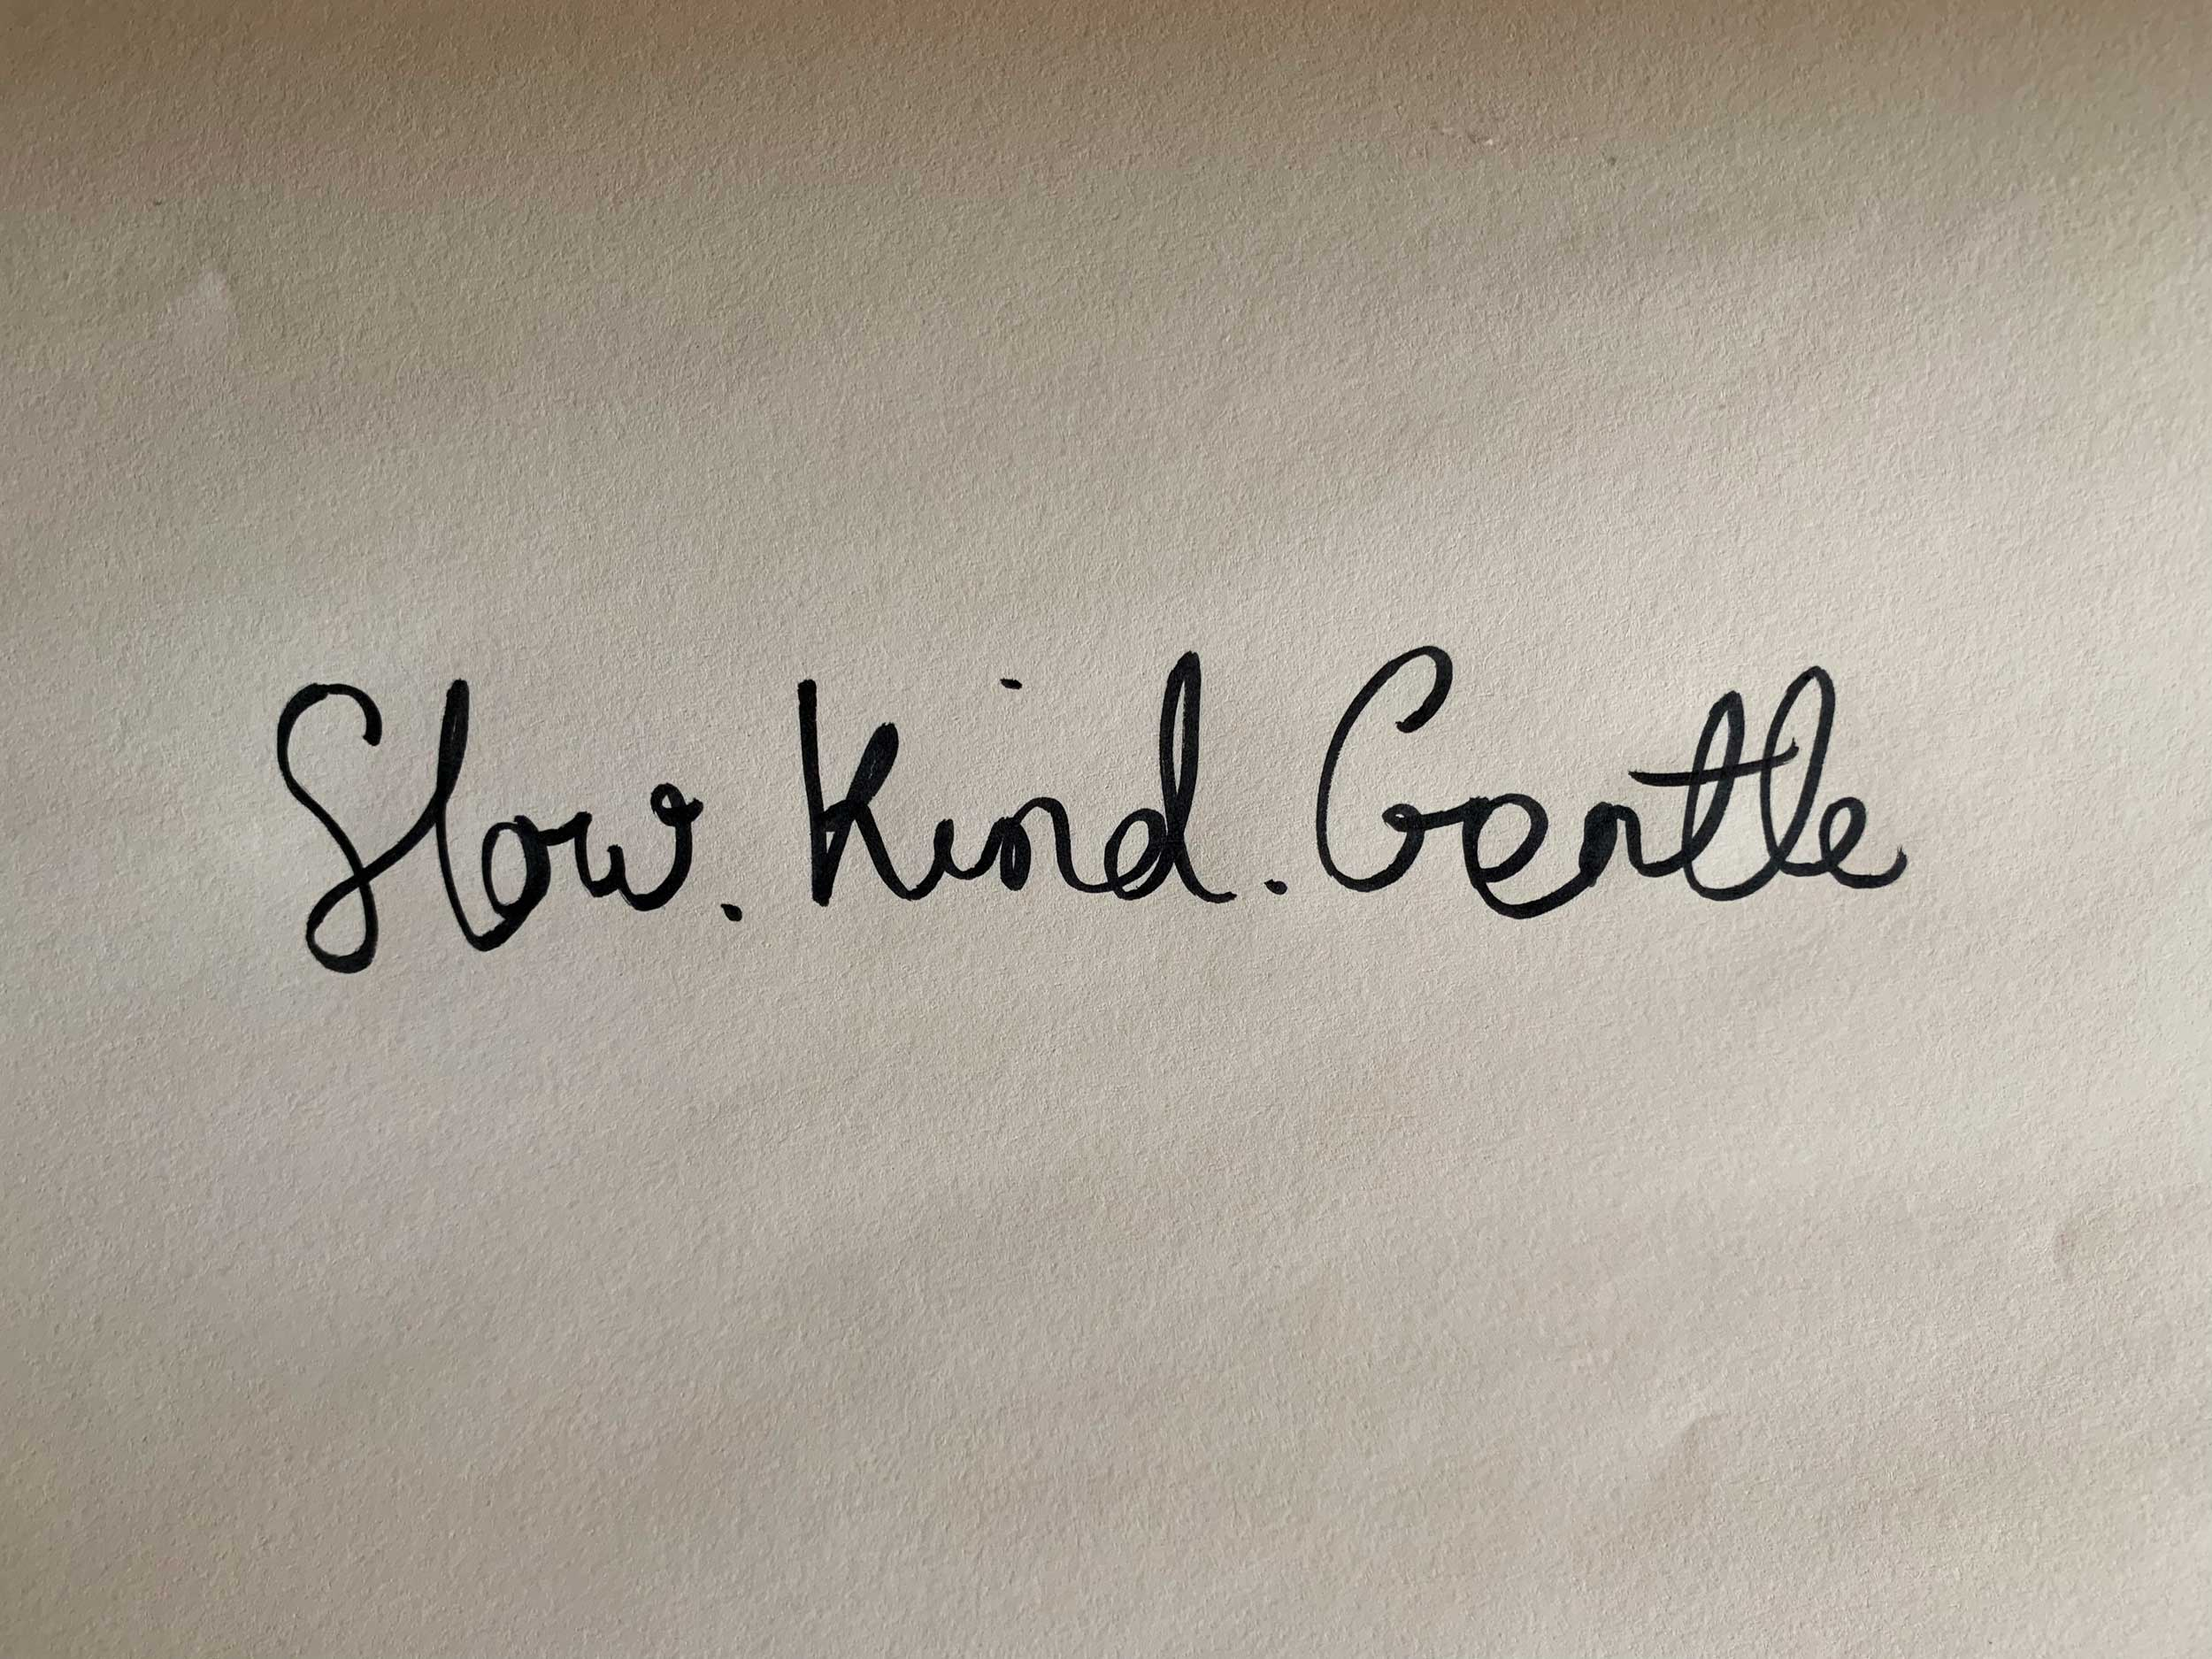 Slow. Kind. Gentle. Drawing Luke Hockley.